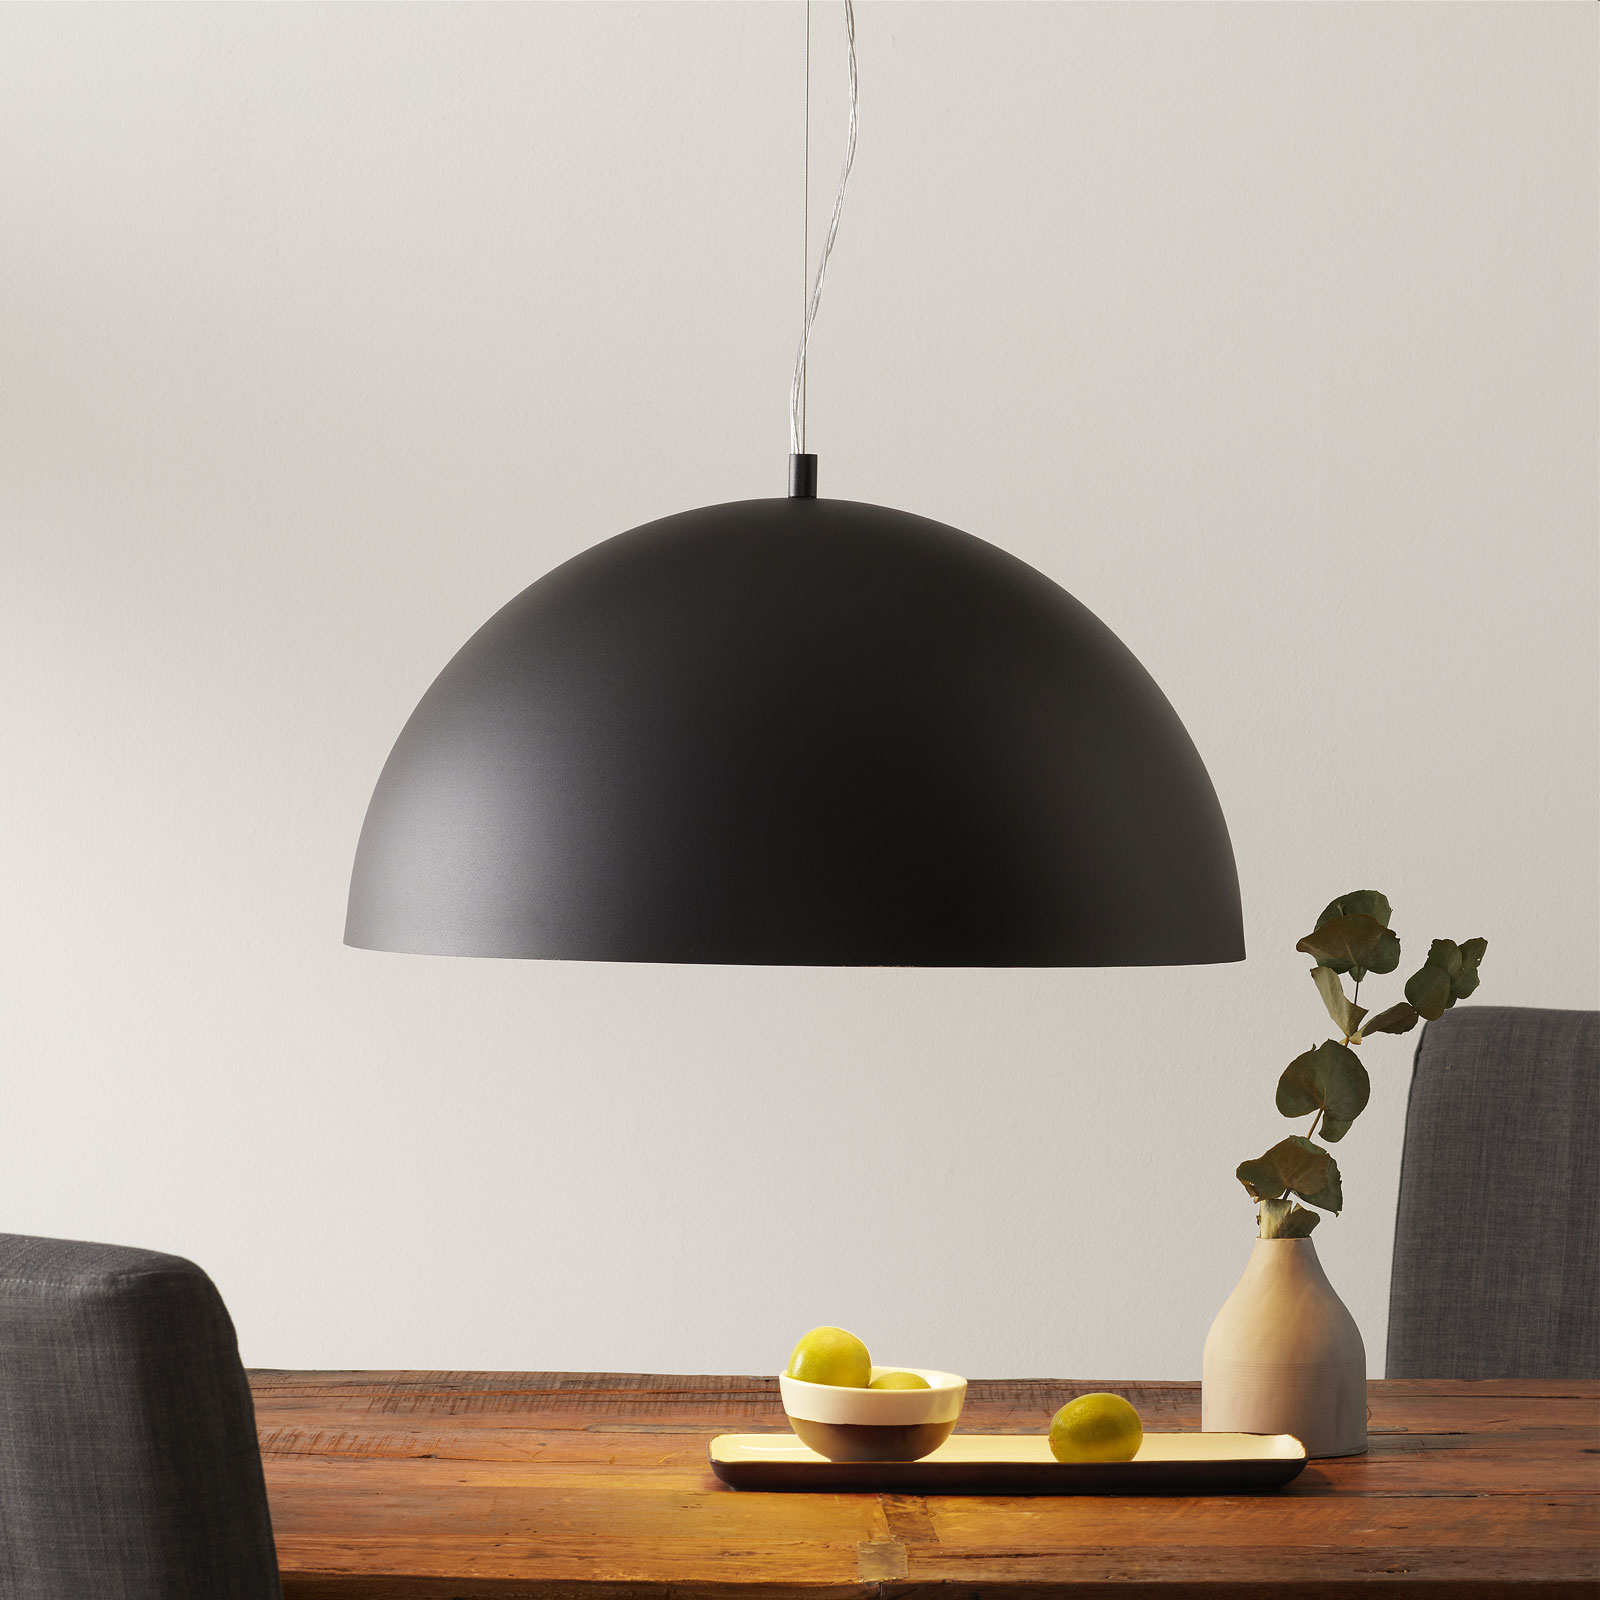 Hanglamp Gaetano 1 zwart/goud